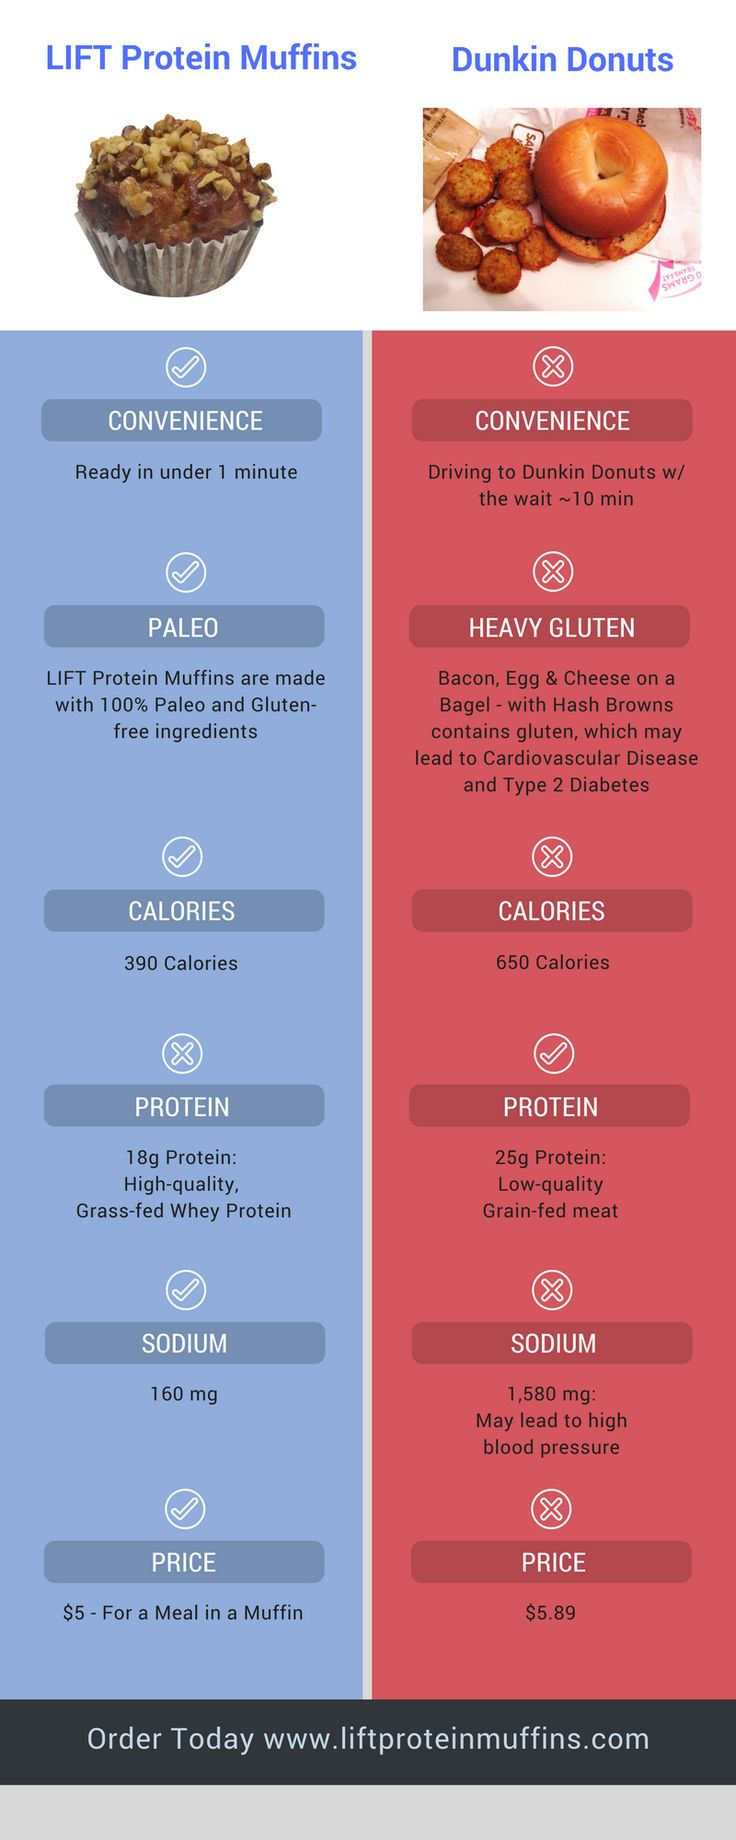 LIFT Protein Muffins Versus Dunkin Donuts